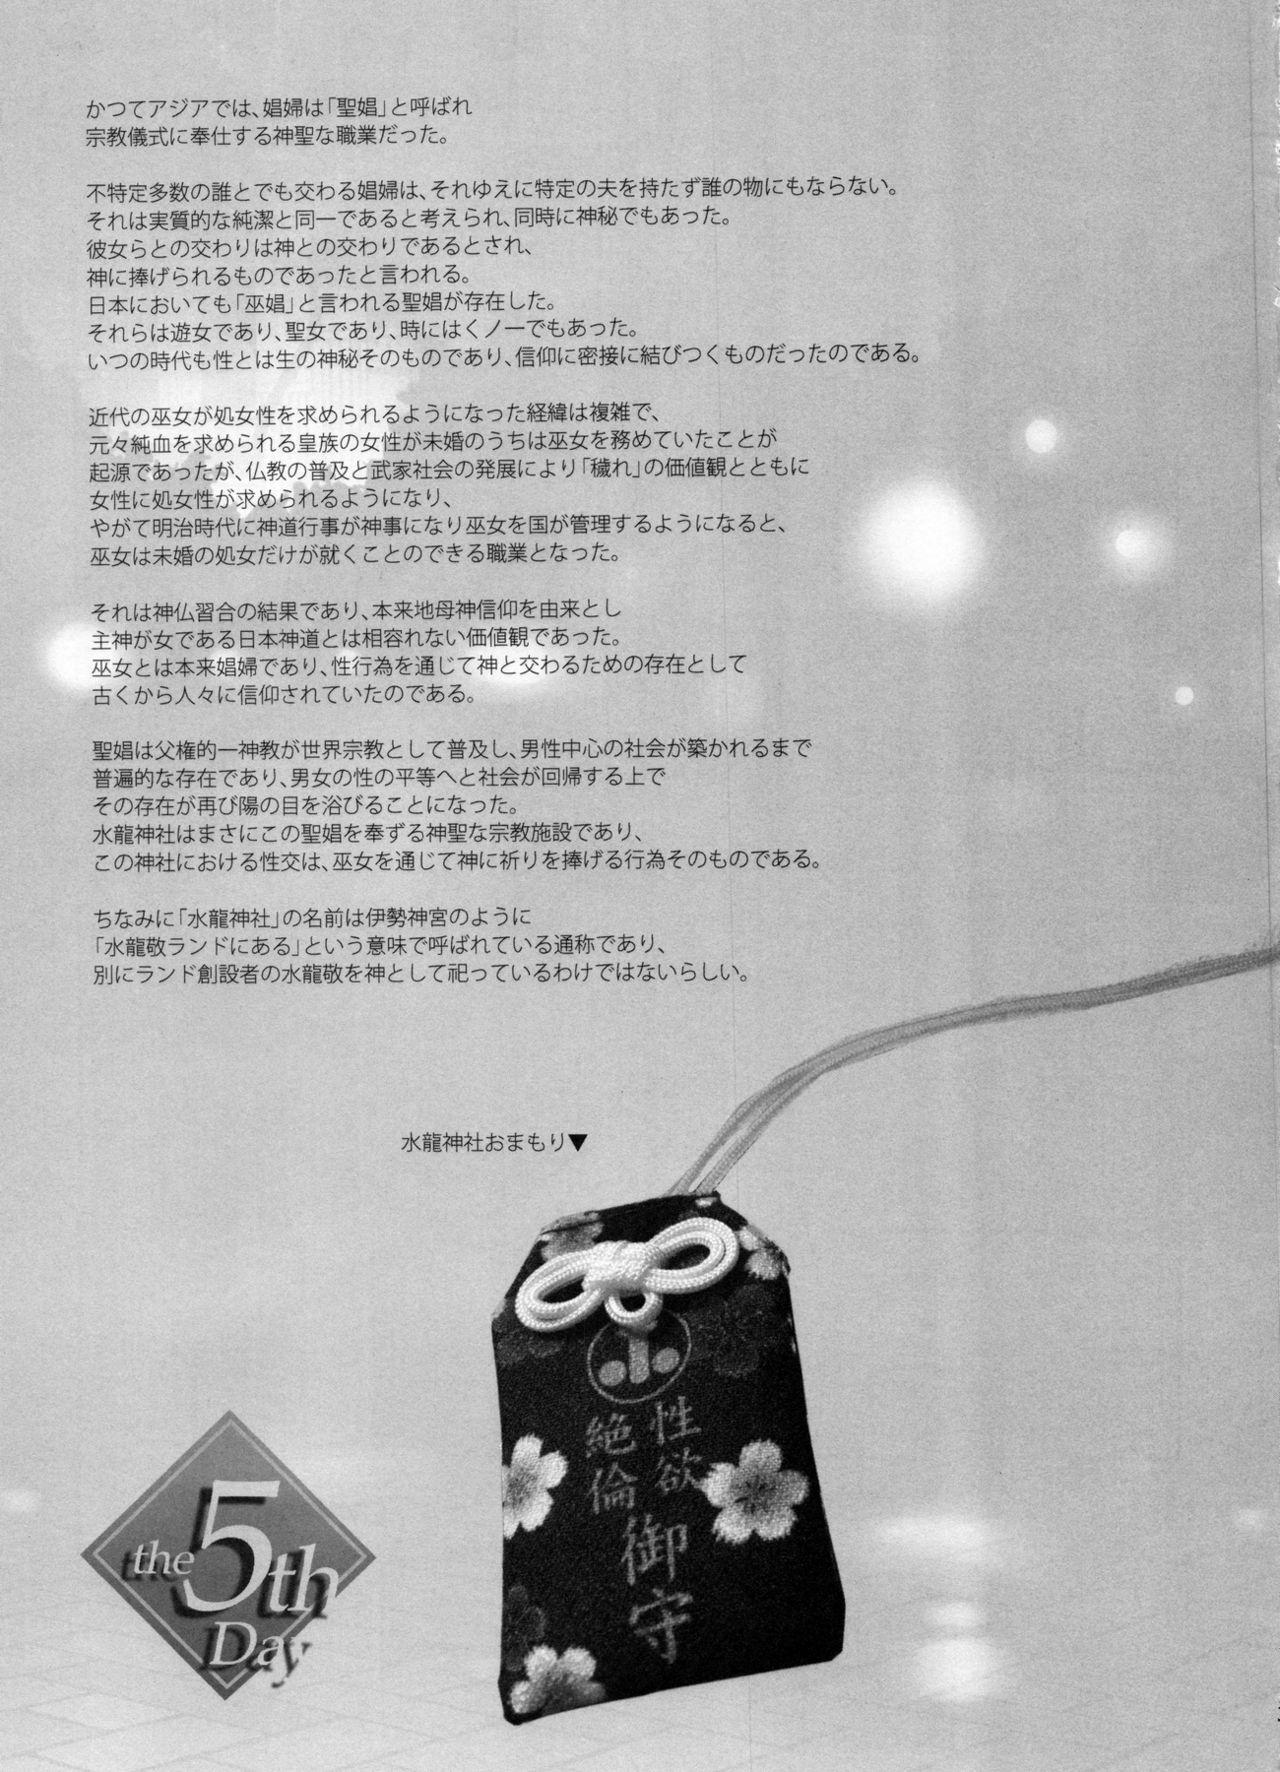 Oideyo! Mizuryu Kei Land the 5th Day 35